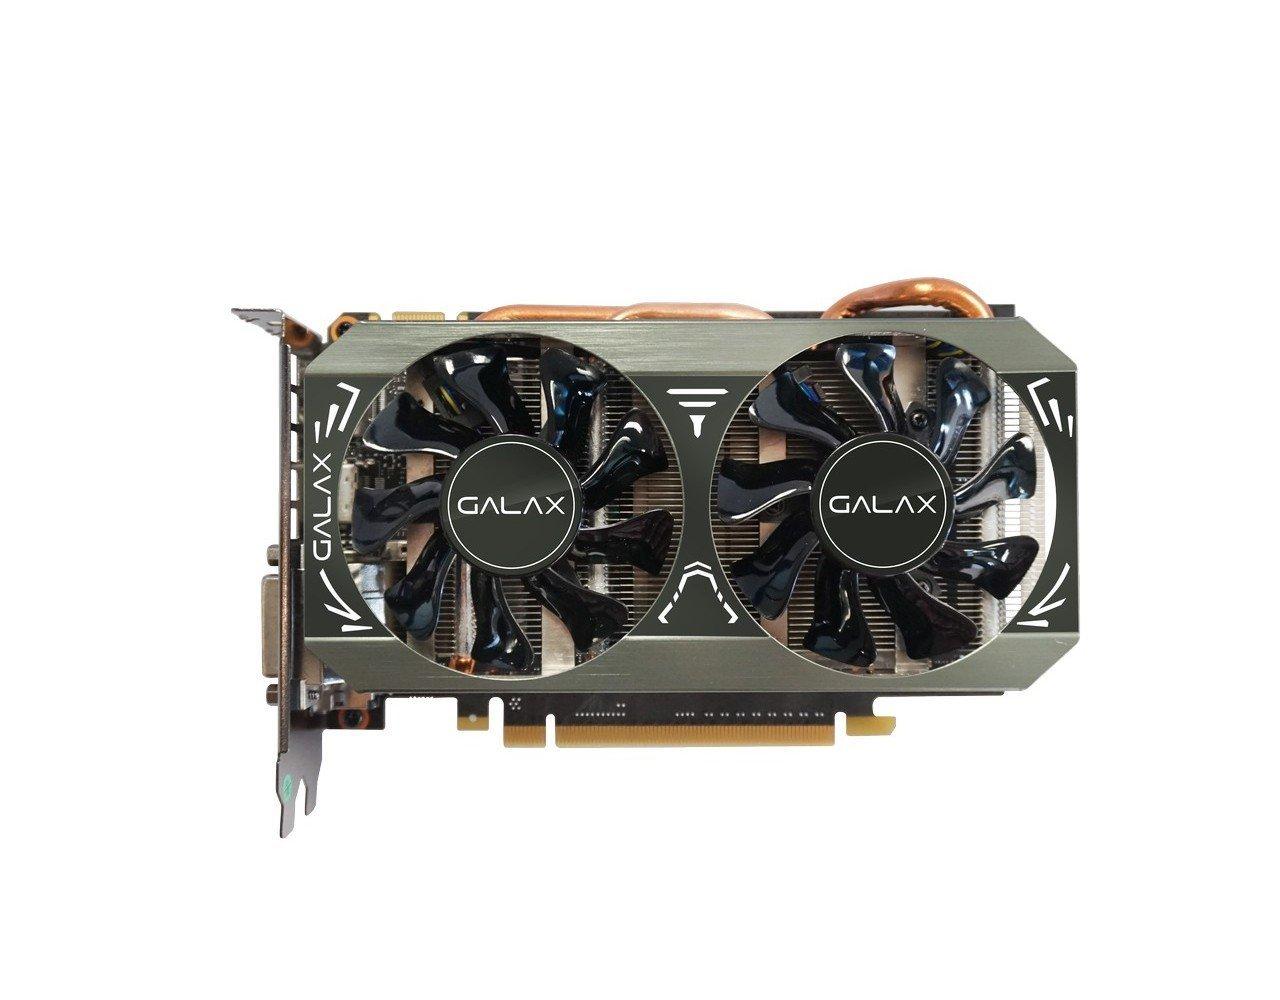 GALAX GeForce GTX 960 OC Tarjeta gráfica: Amazon.es: Informática